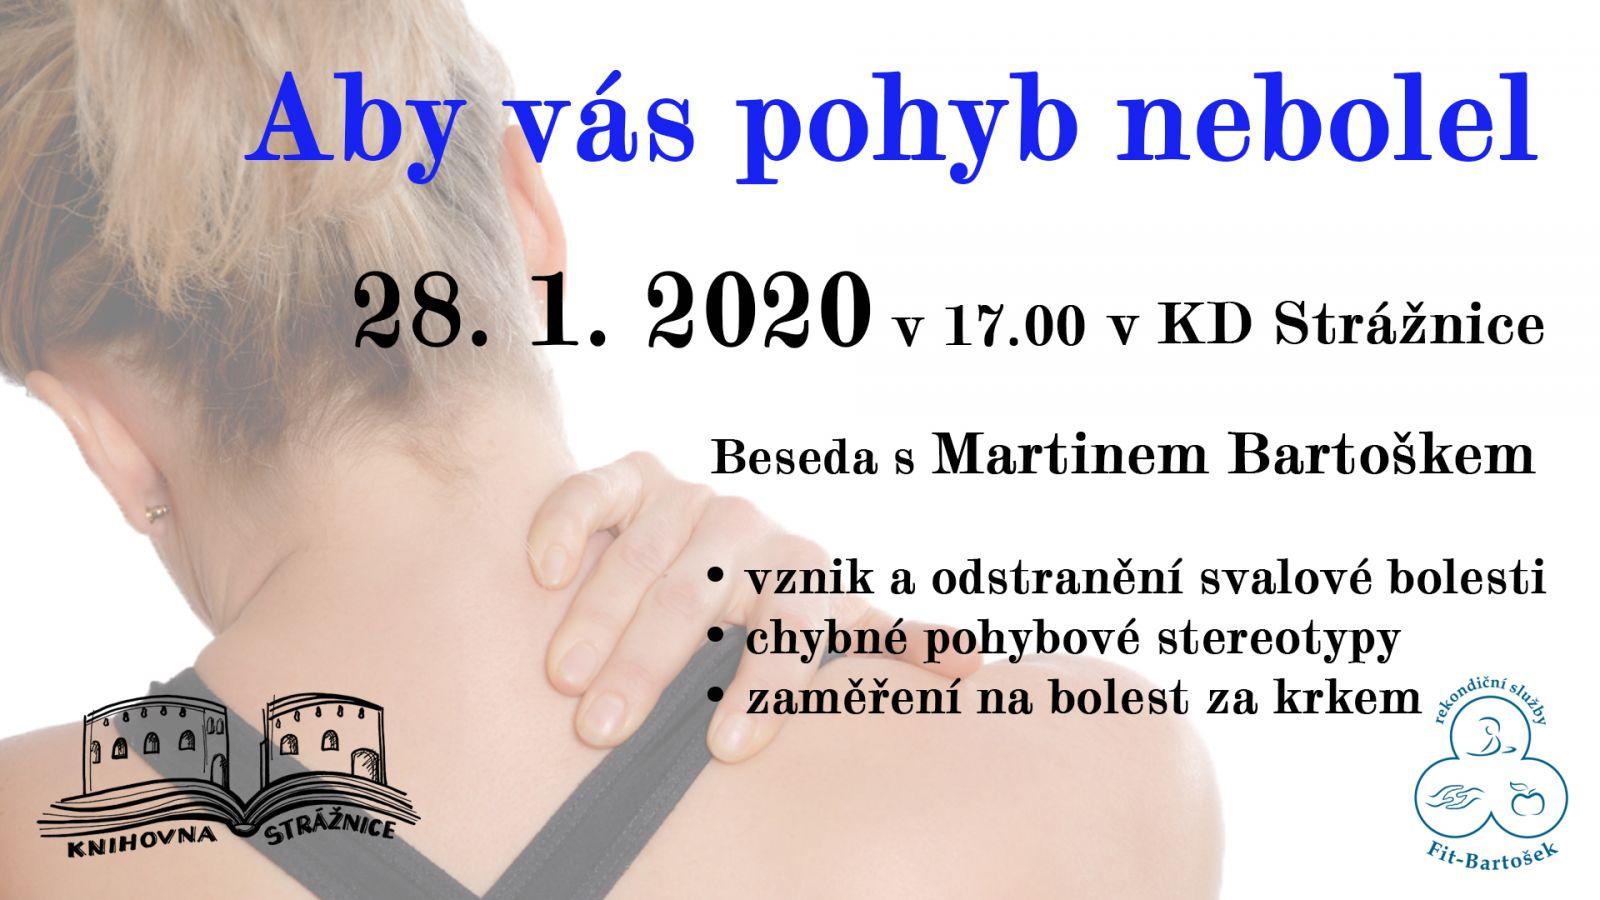 Aby vás pohyb nebolel 28. 1. 2020 v 17.00